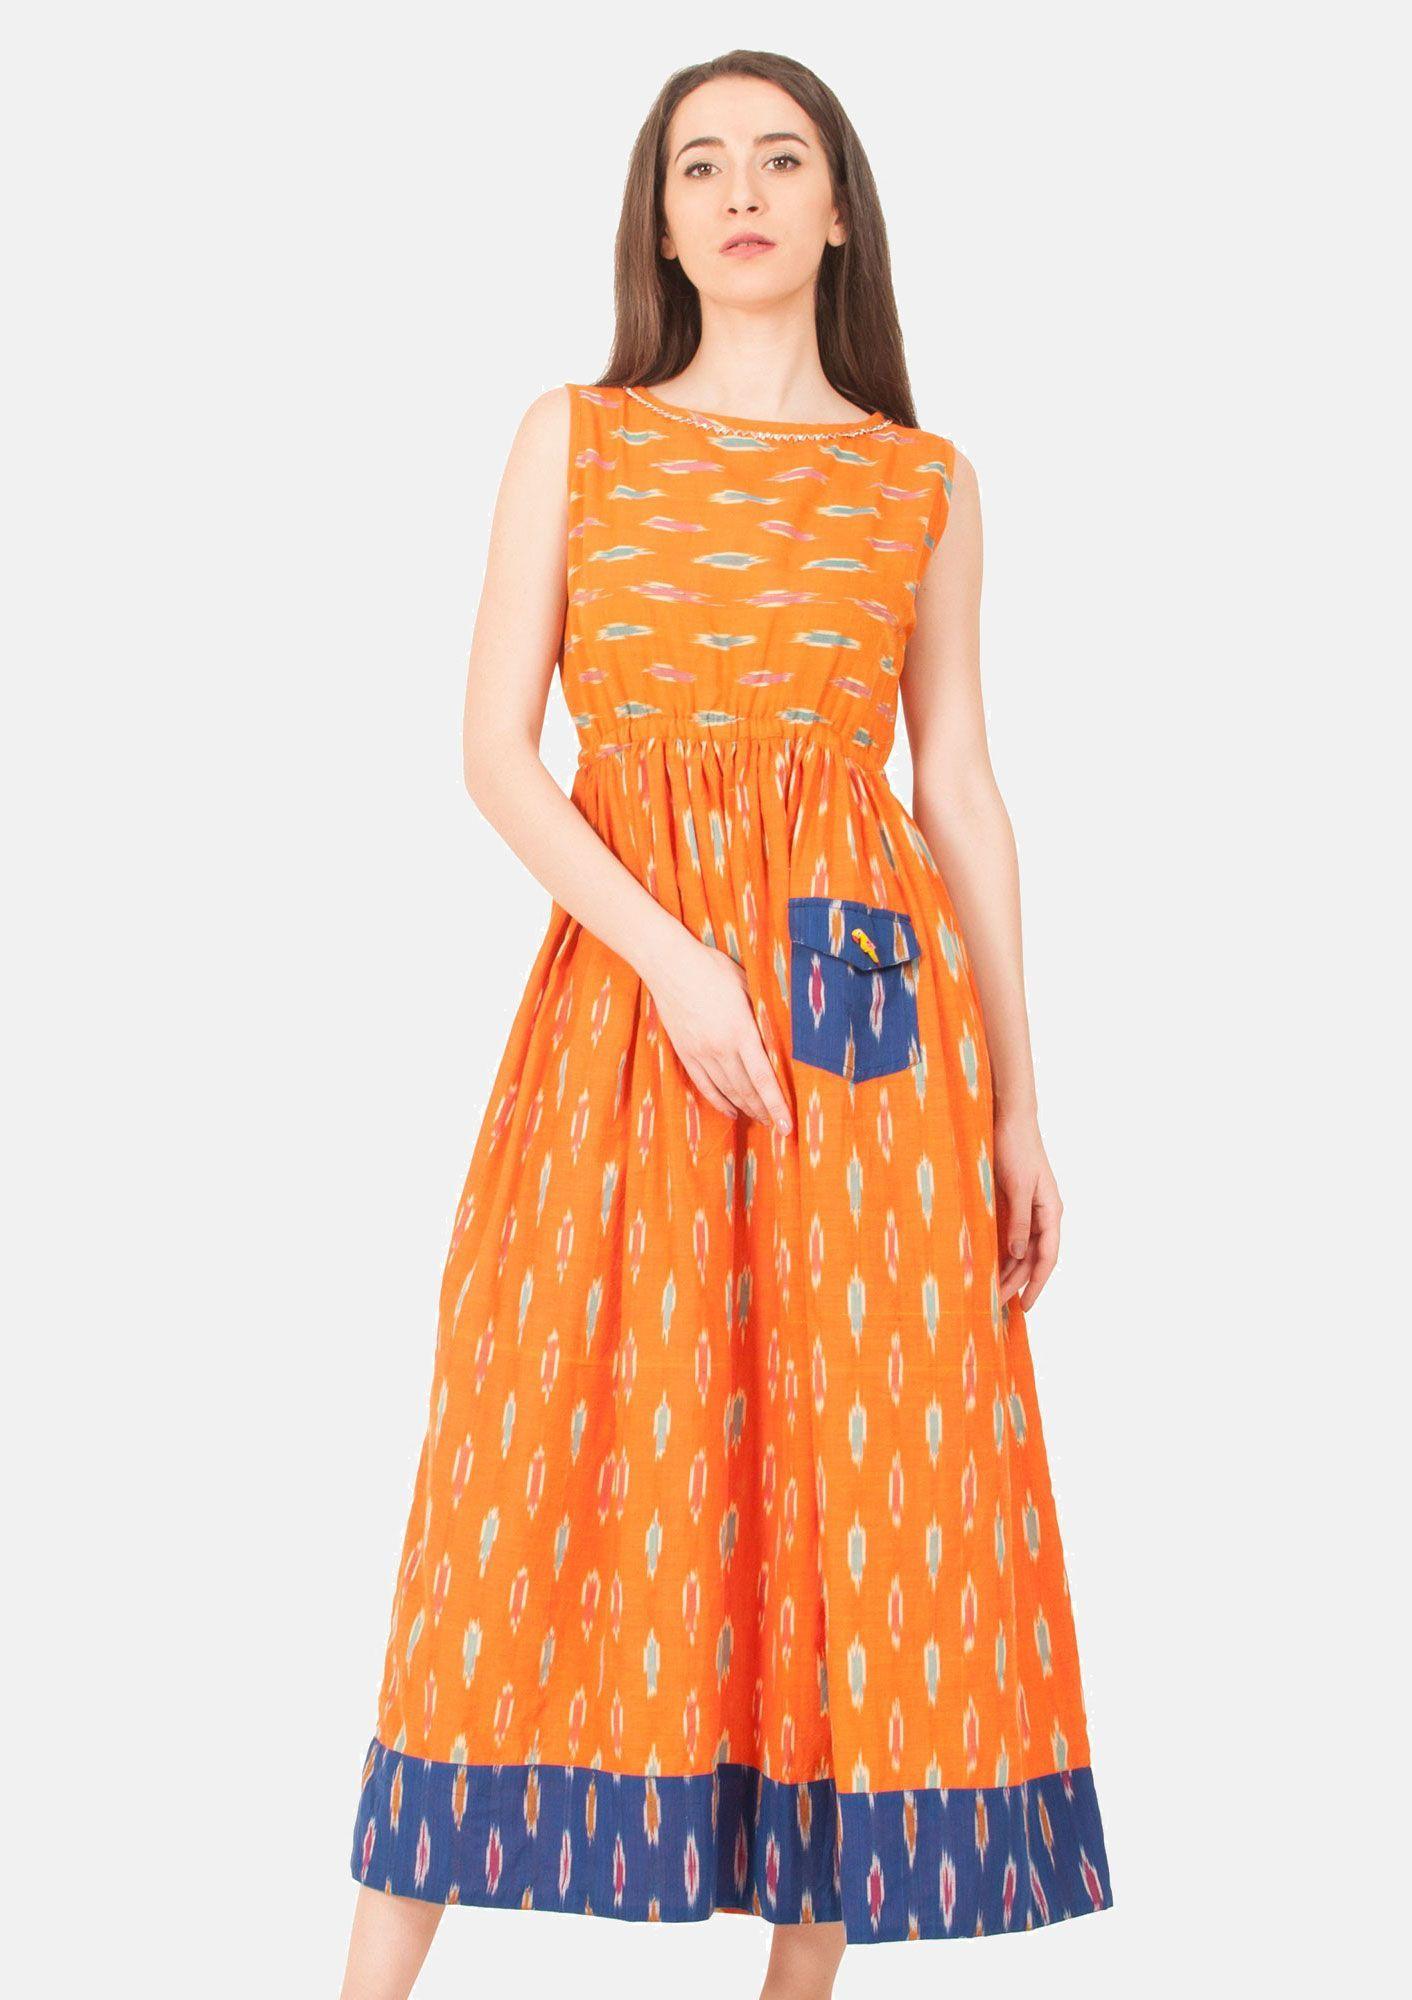 Handwoven long ikat dress tunic and dresses FL KINUDRESS This Ikat ... for Ikat Fabric Dress  584dqh